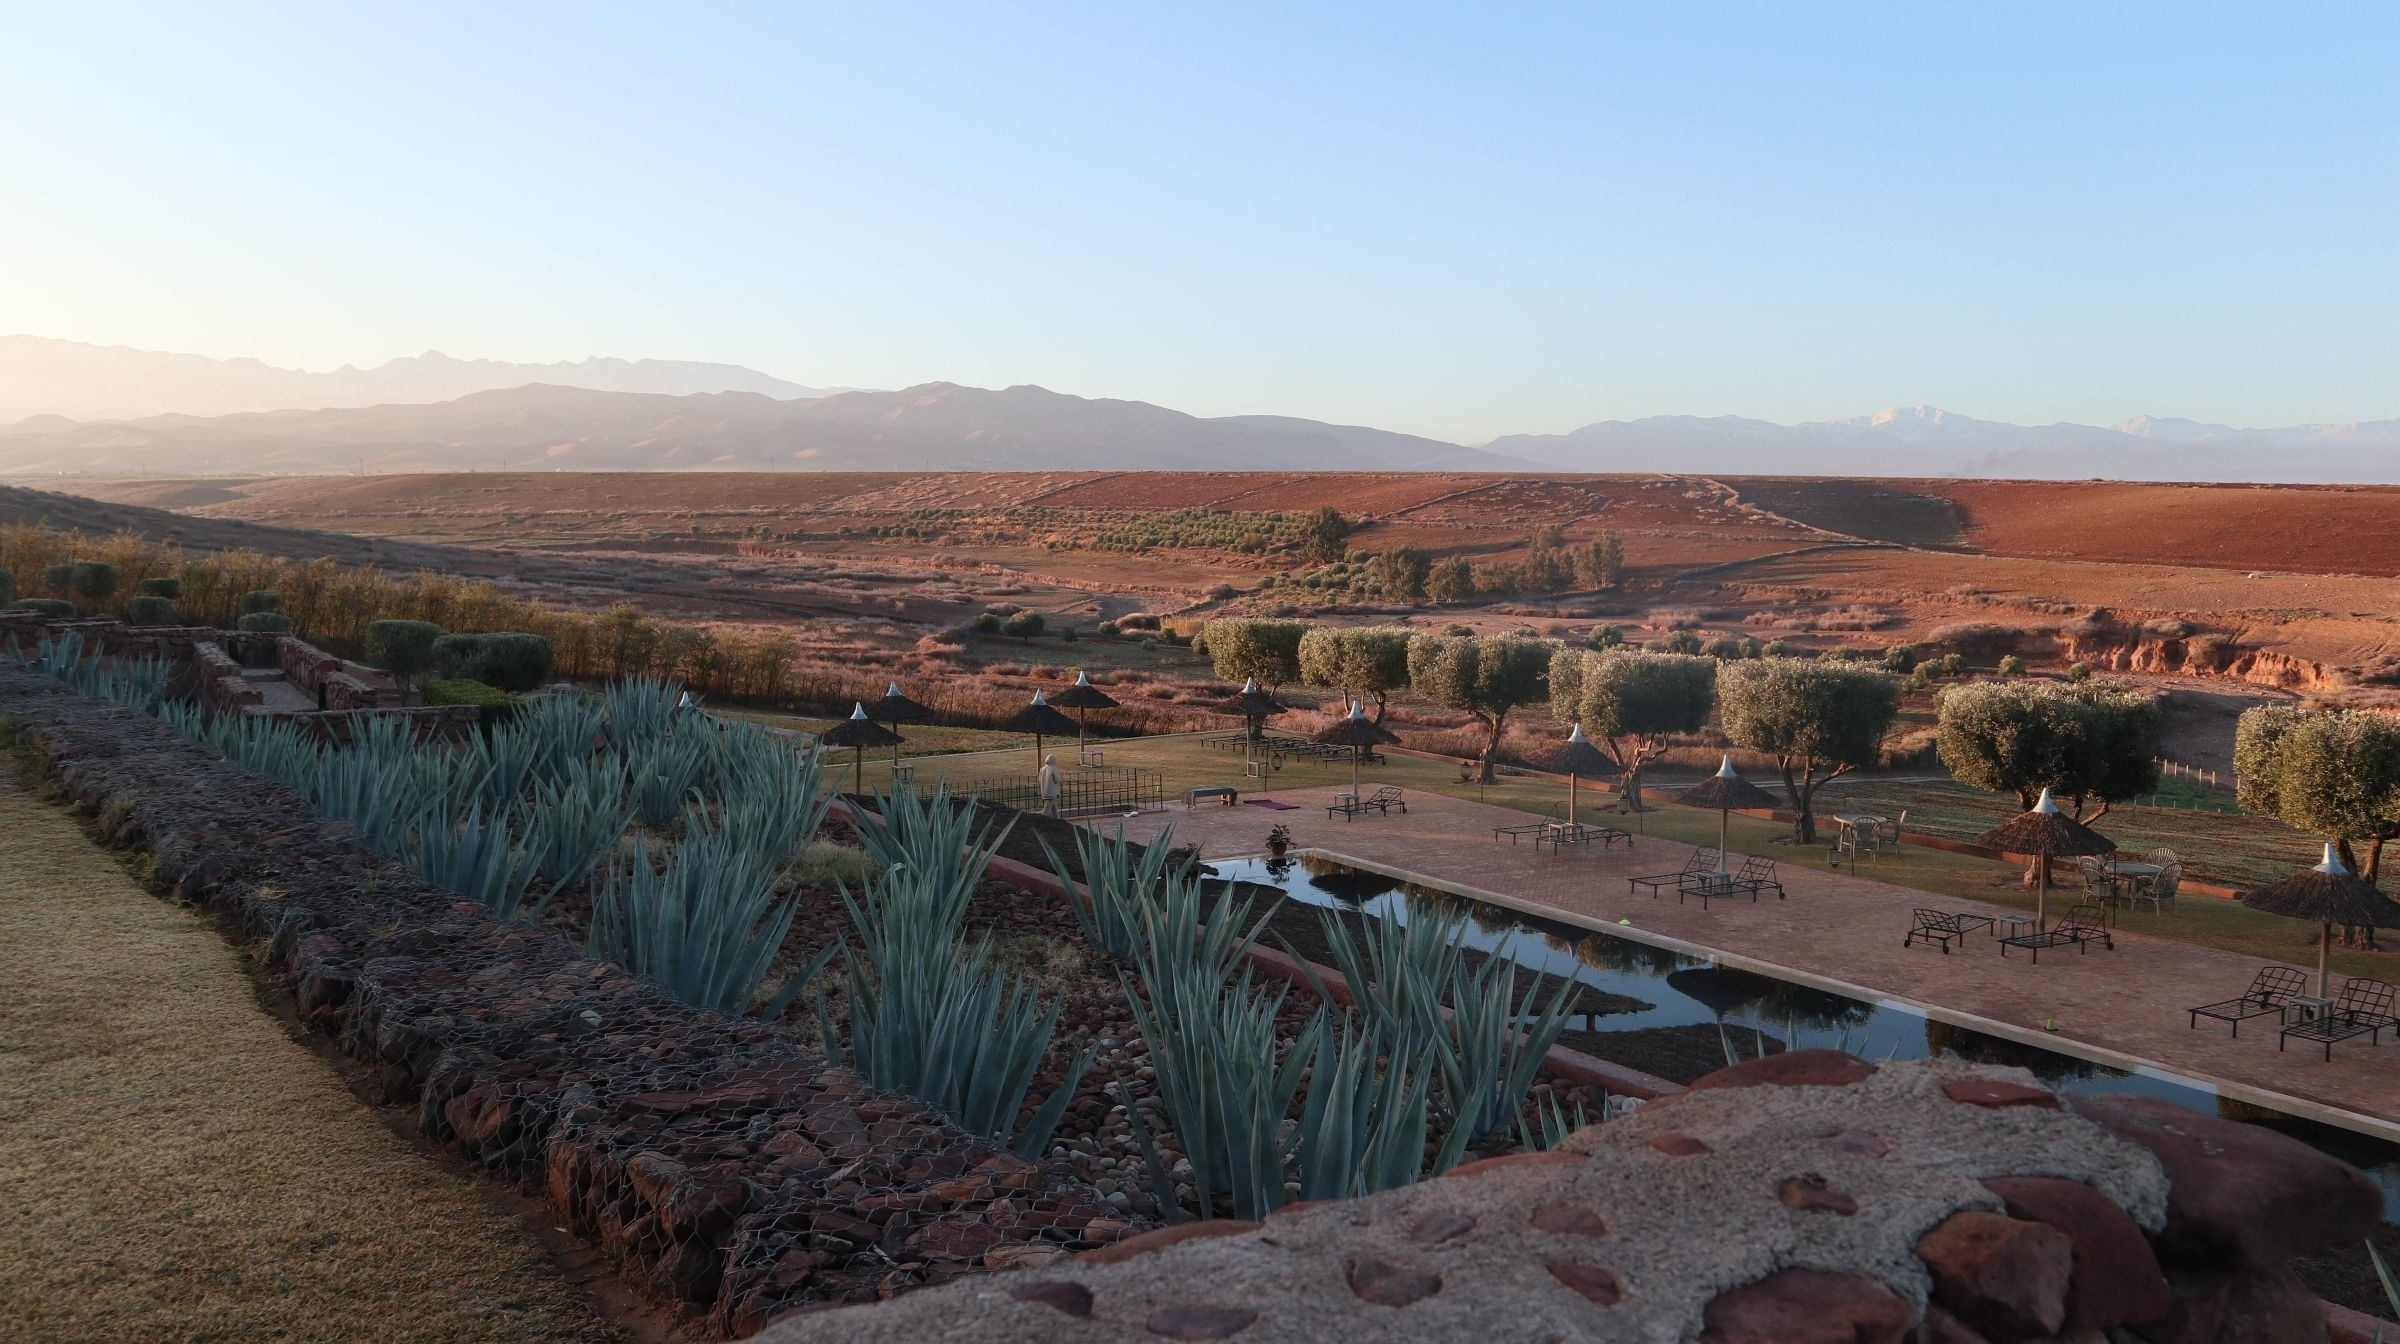 View across the pool at sunrise at Palais Paysan Marrakech